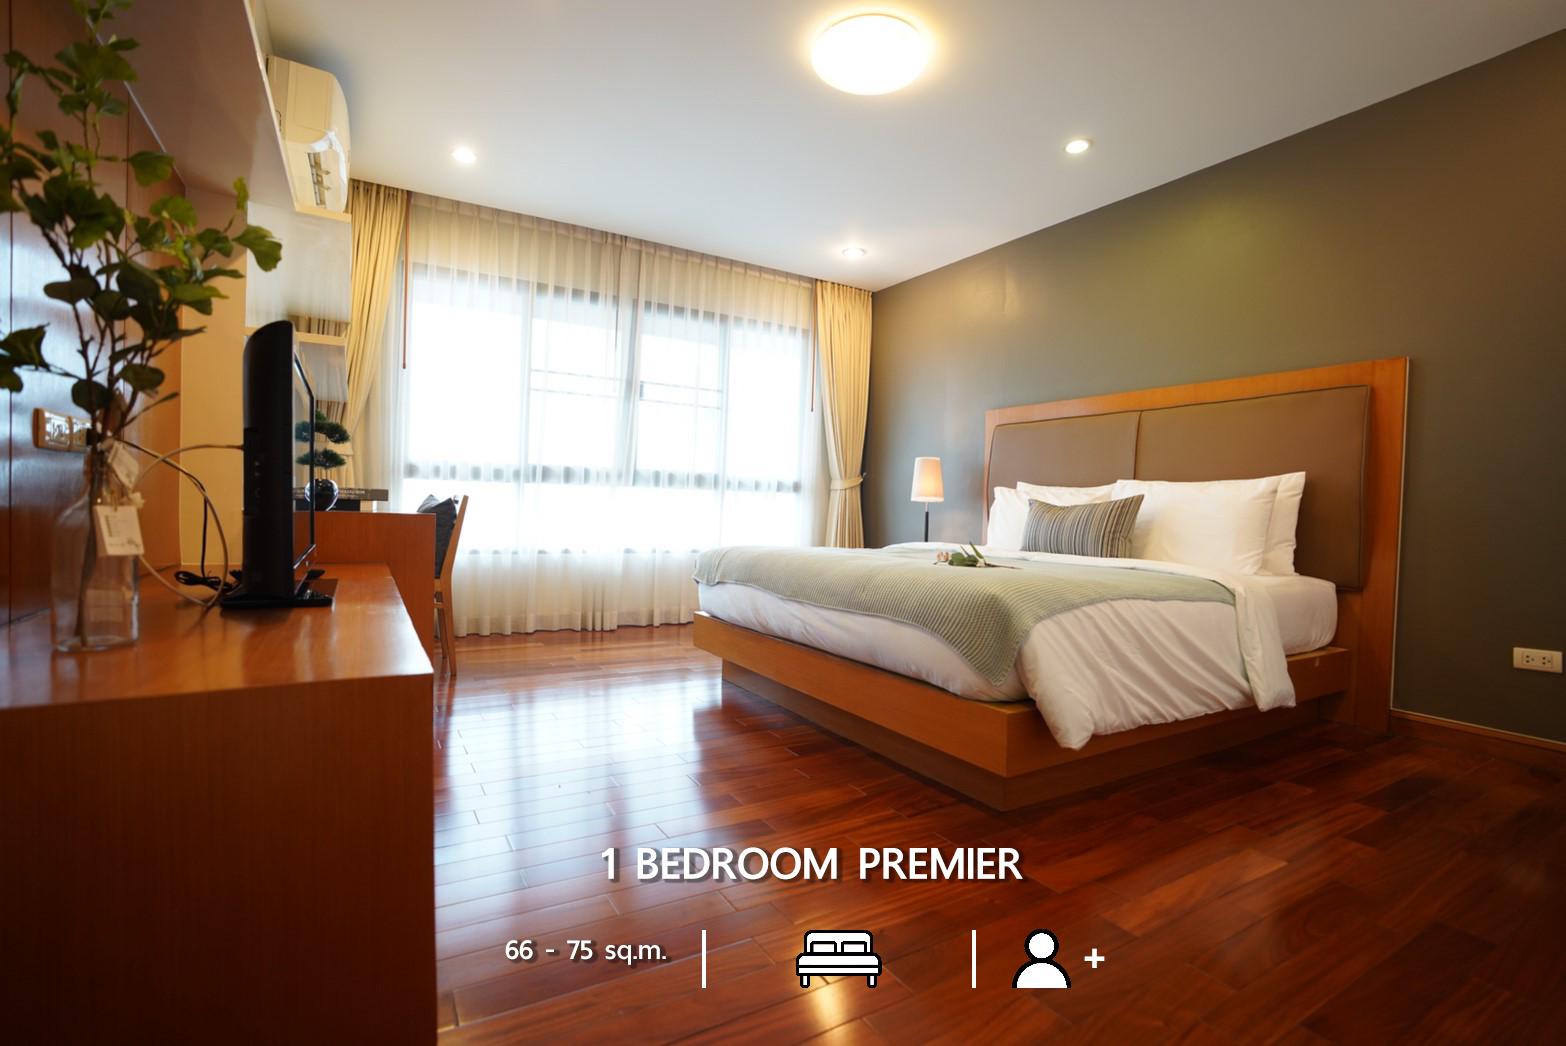 1 Bedroom Premier Sunshine Sriracha Hotel & Service Apartment